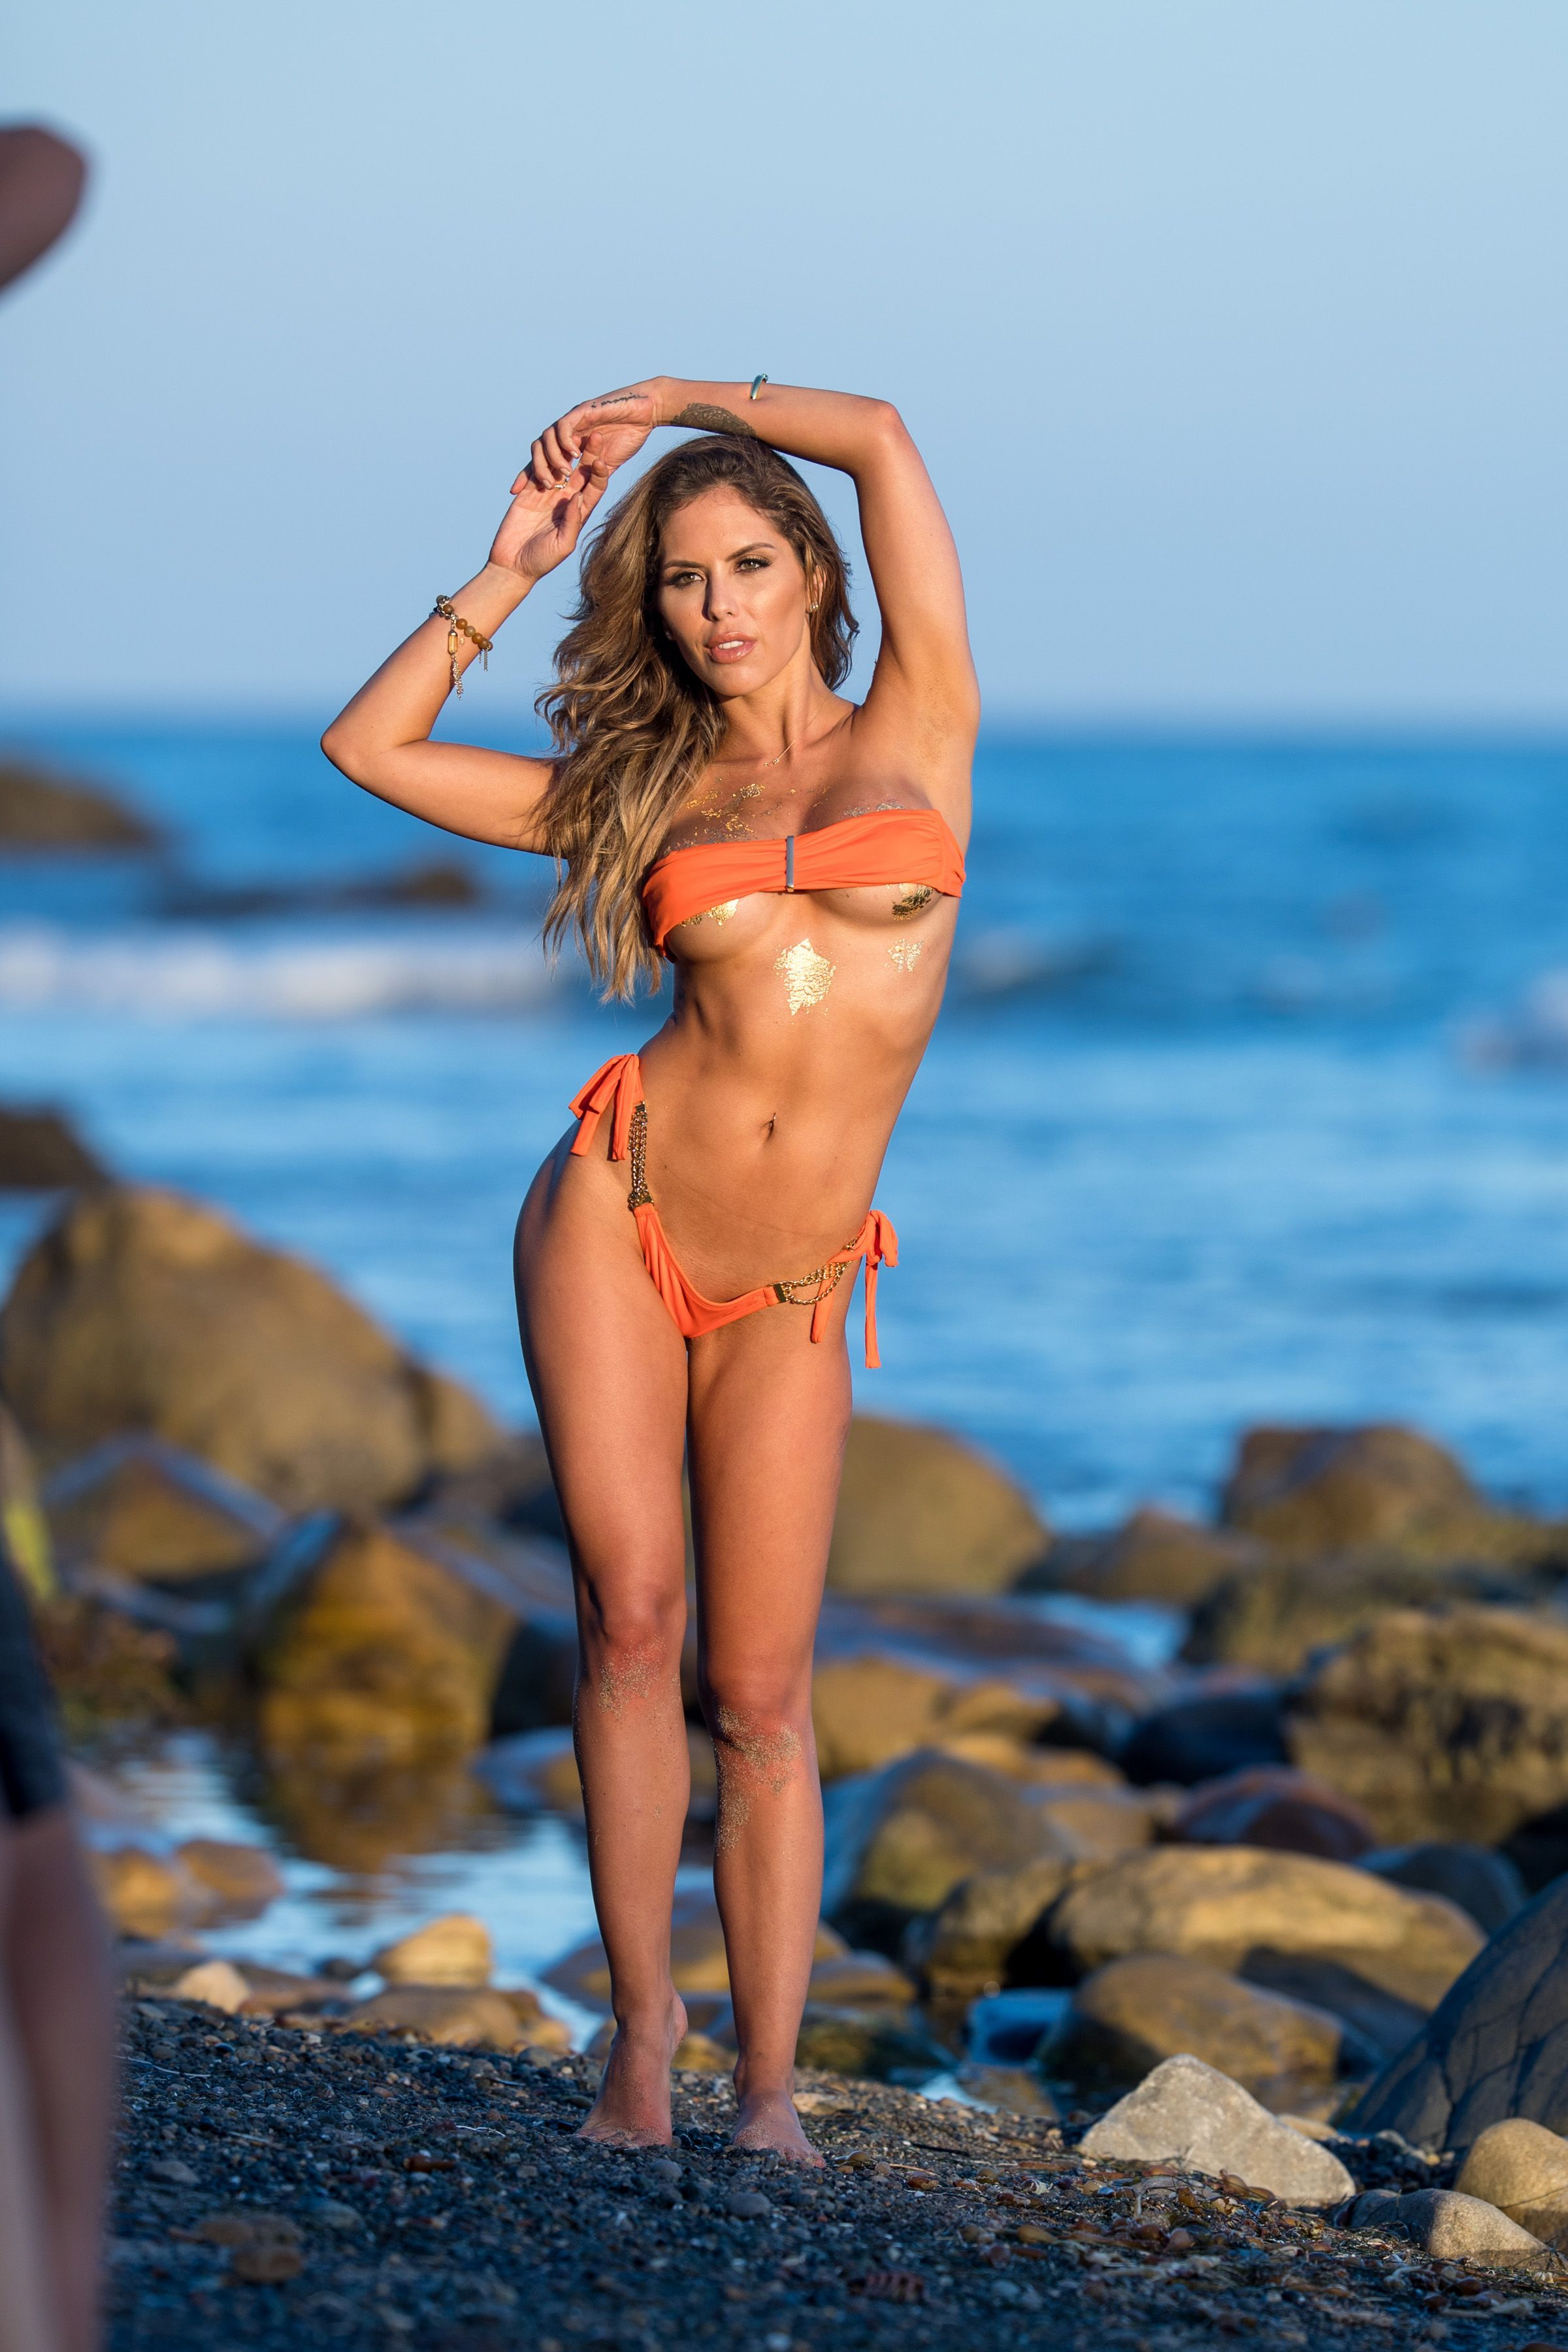 Brittney-Palmer-Sexy-Topless-30-thefappeningblog.com_.jpg